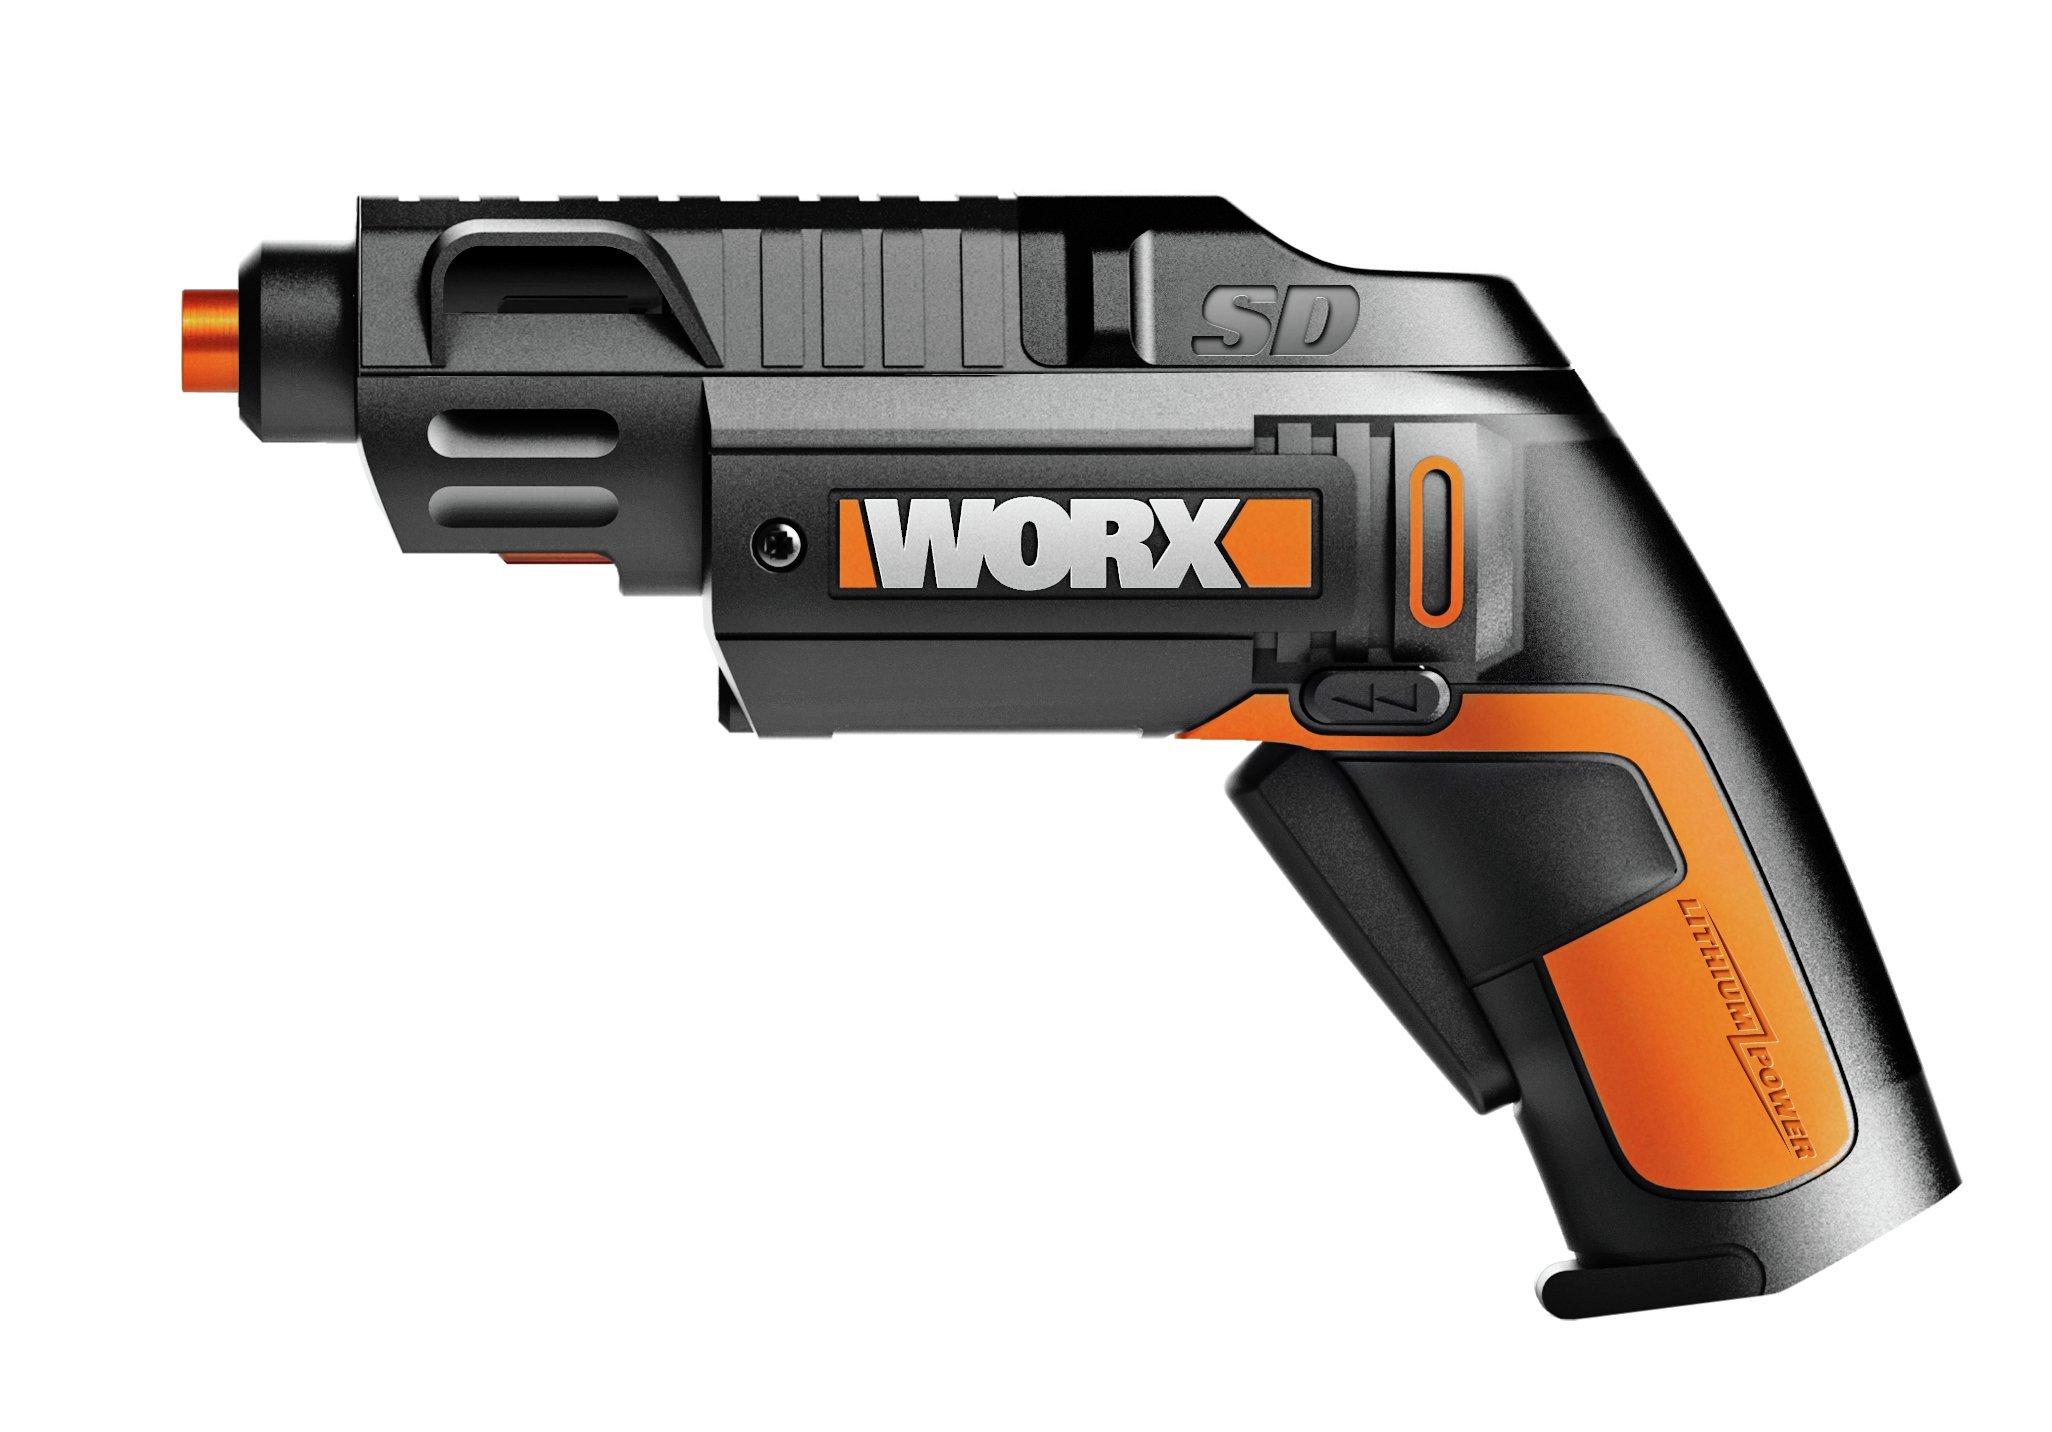 Worx - Wx254 Cordless Screwdriver - 4V lowest price